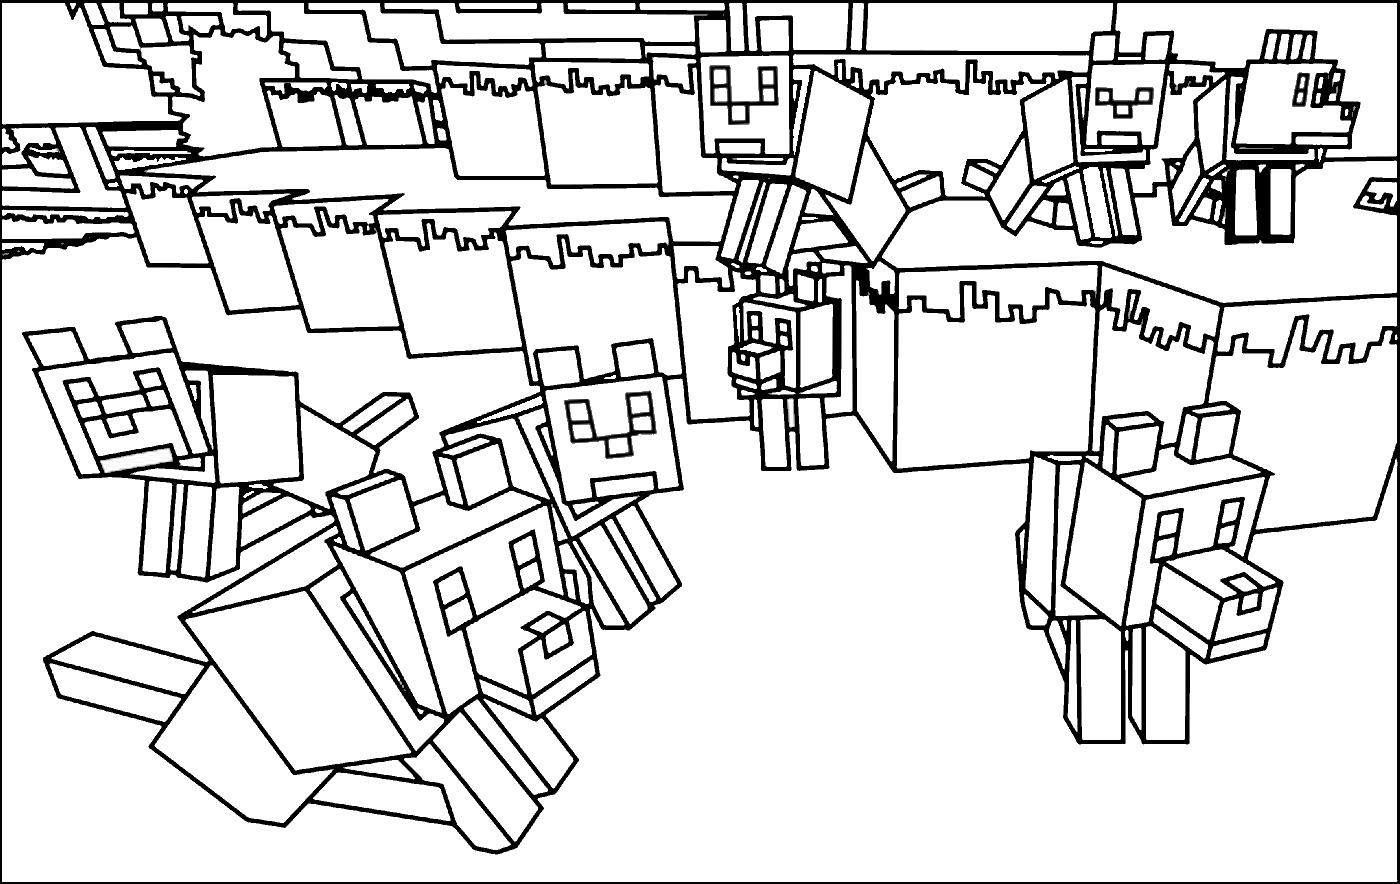 Coloriage A Imprimer Minecraft Minecraft Coloring Pages Coloring Pages To Print Super Coloring Pages